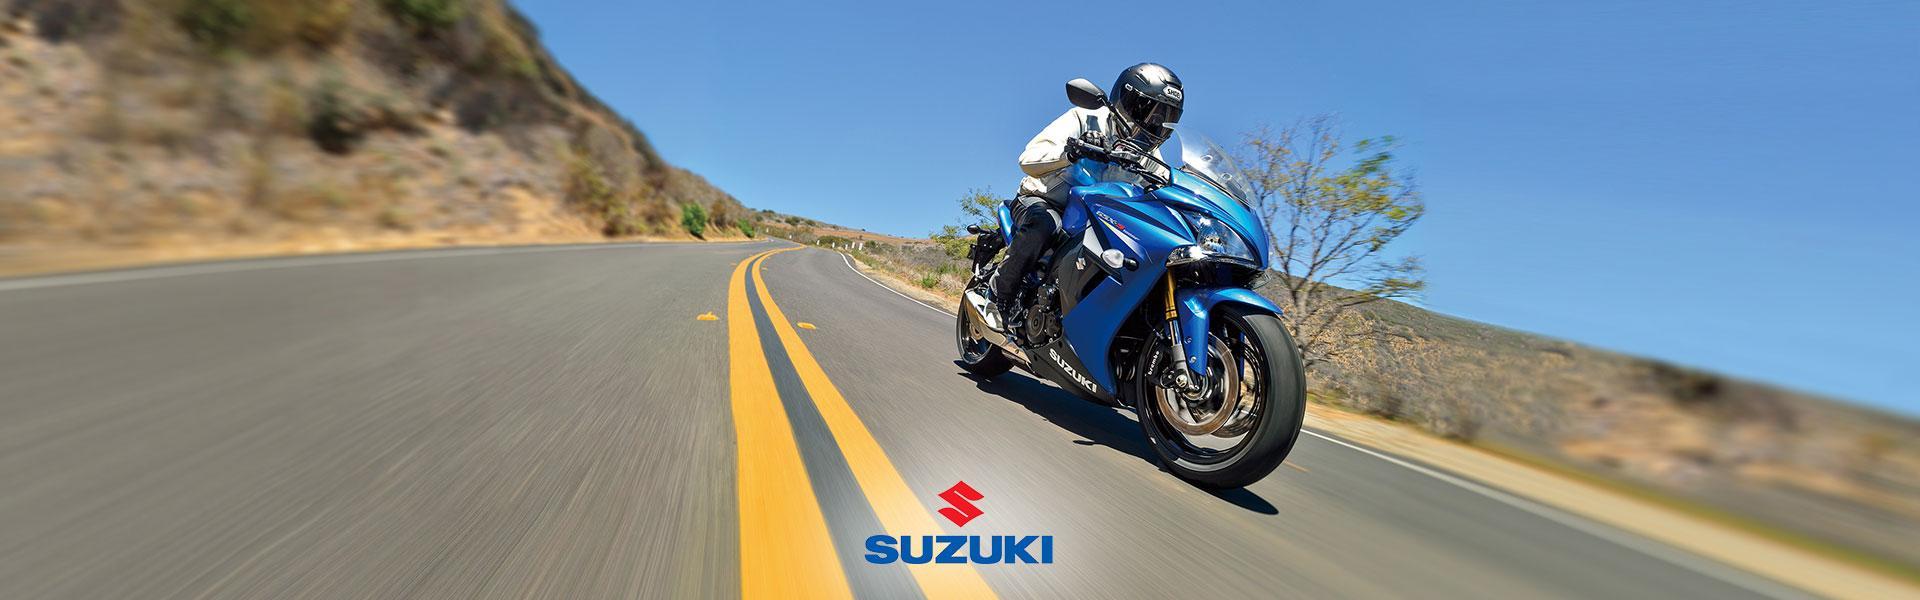 Vendita Moto Suzuki